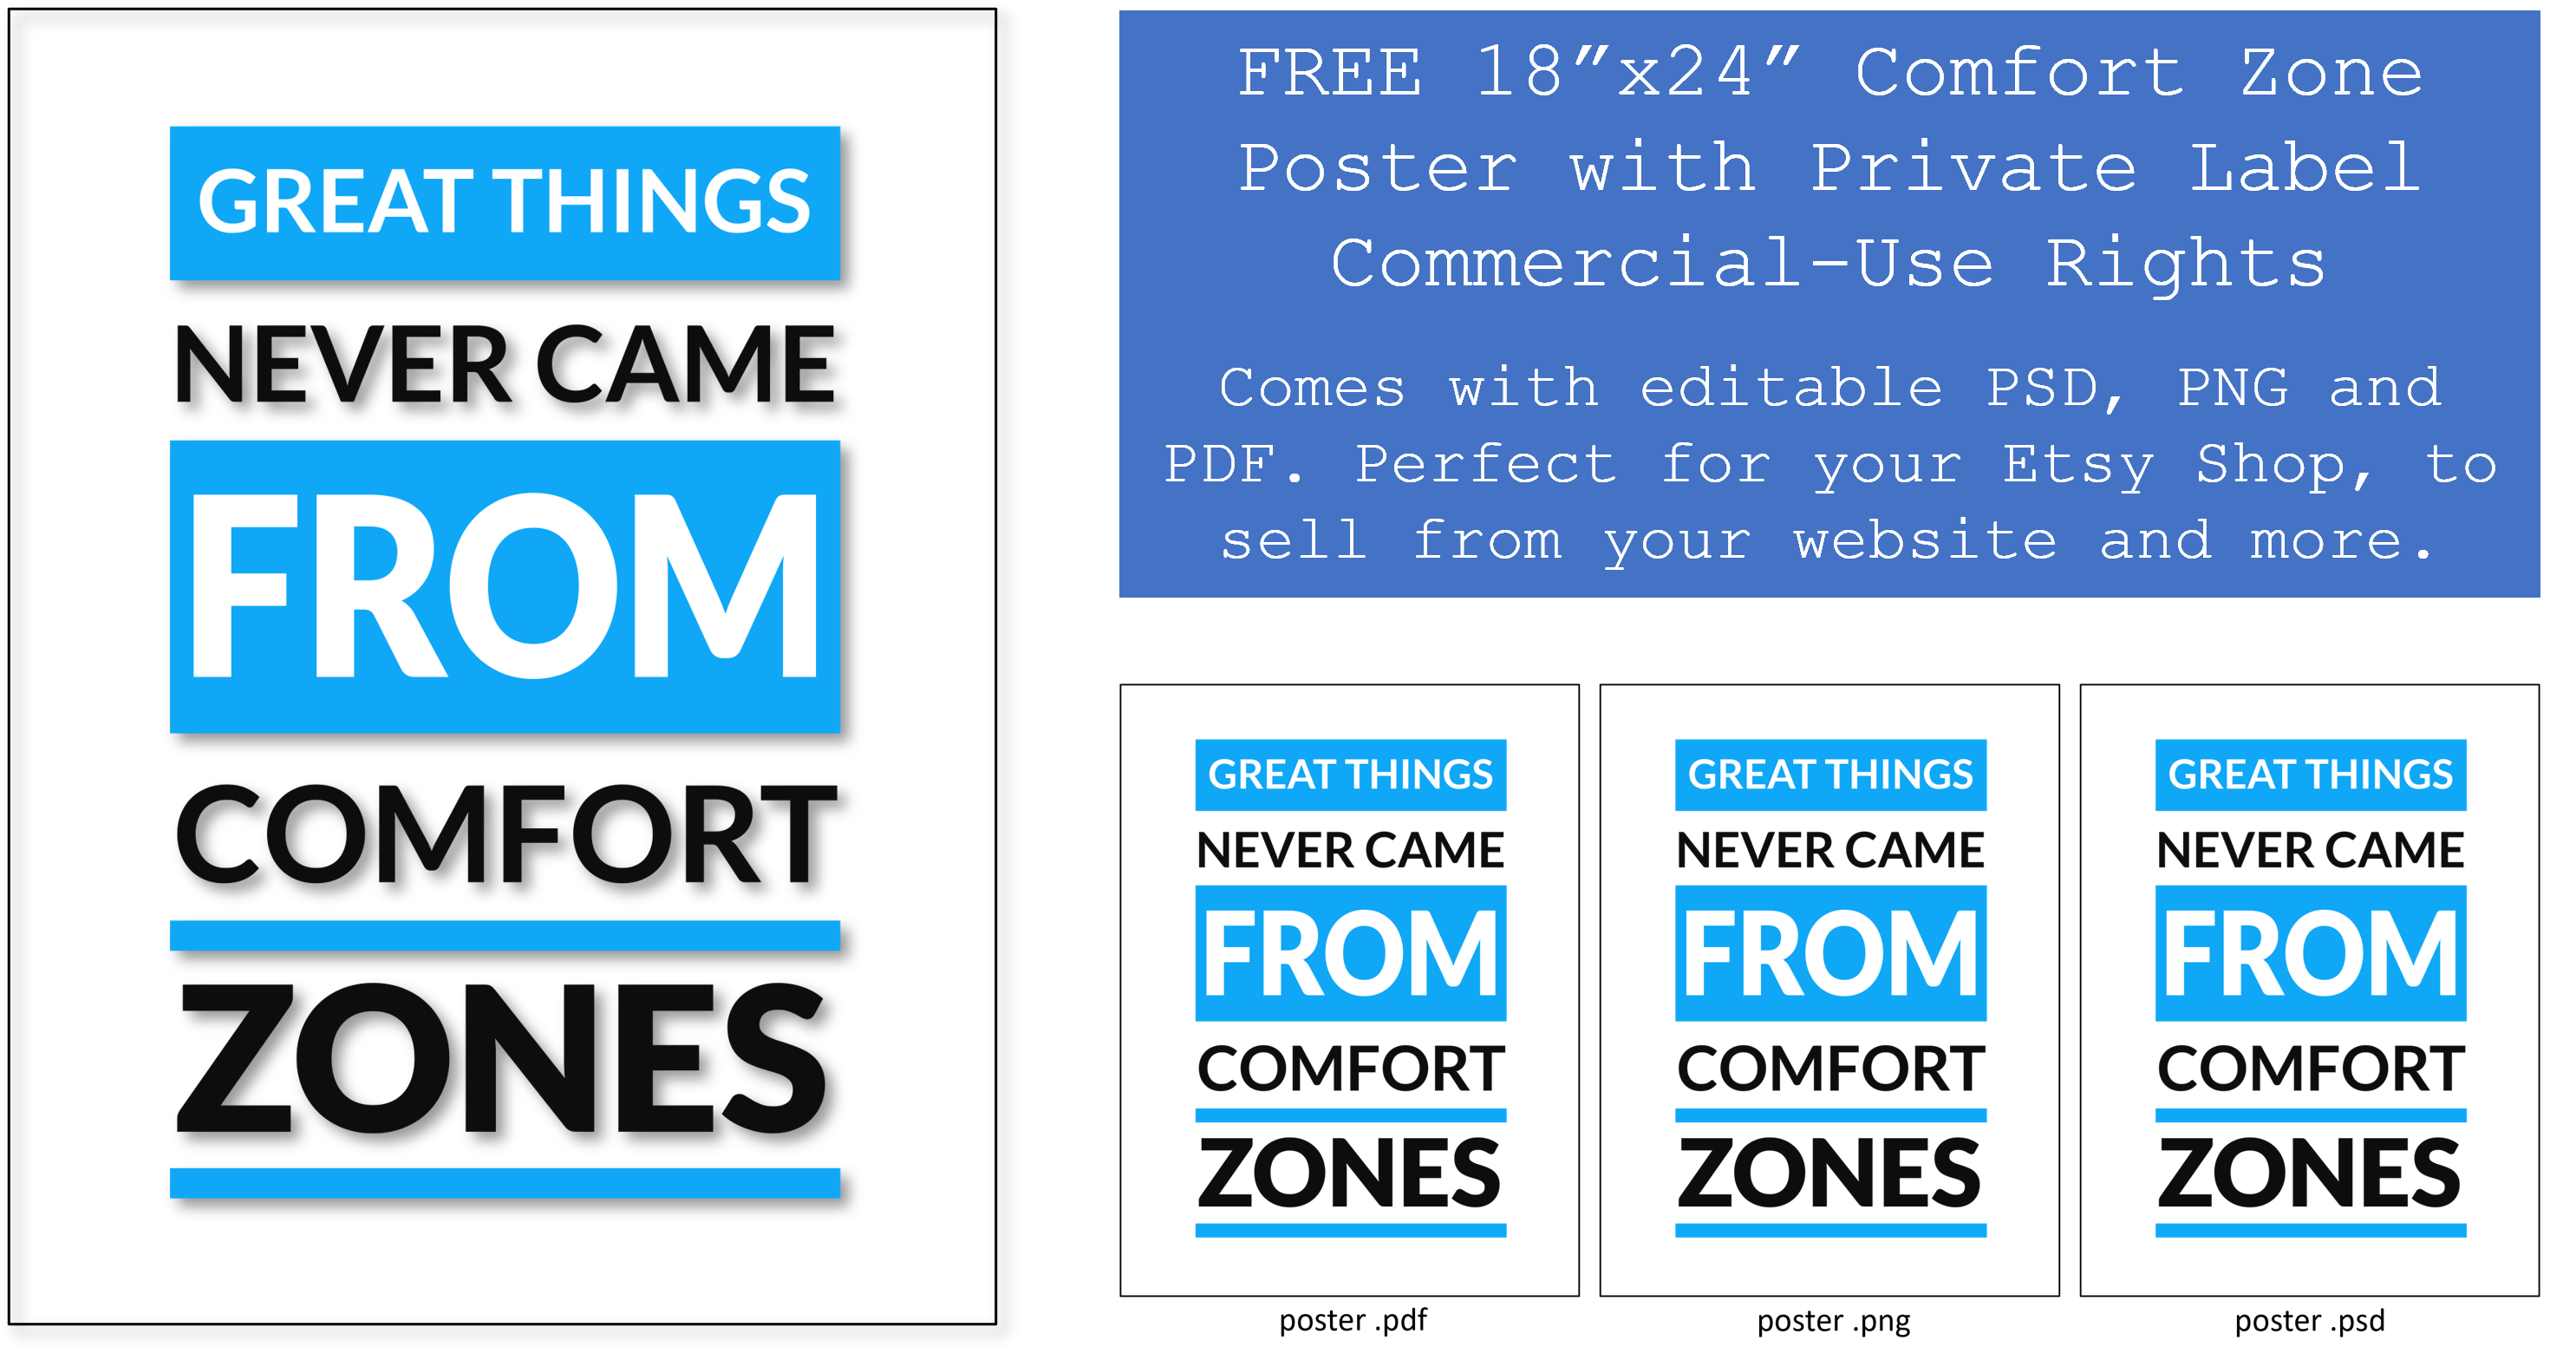 free comfort zone image Entrepreneur's Kit Hub